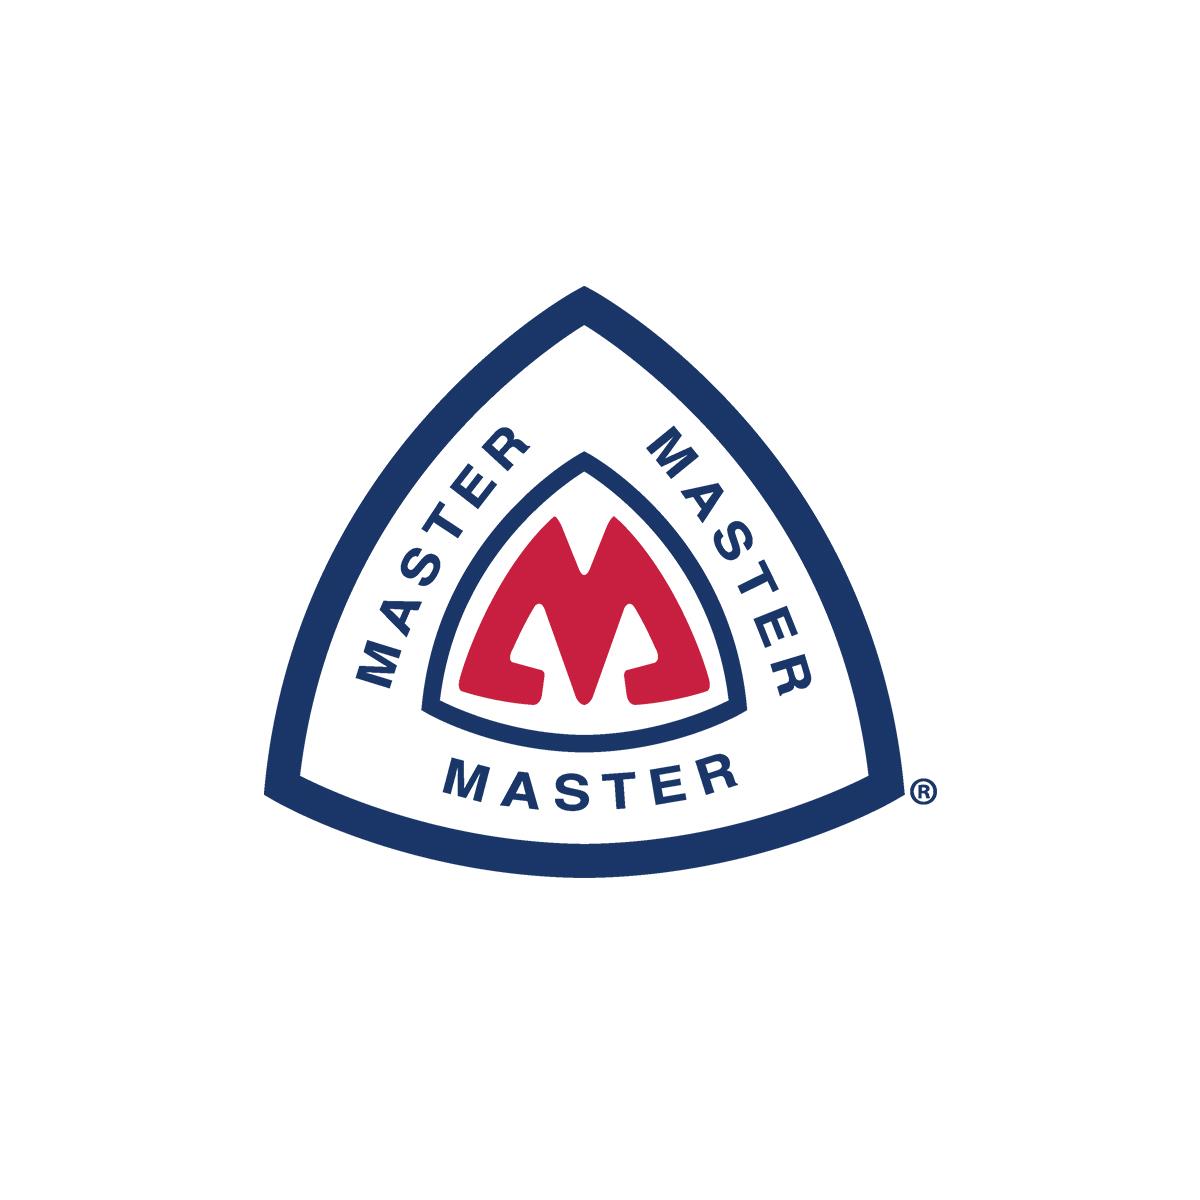 Master Well COmb.jpg